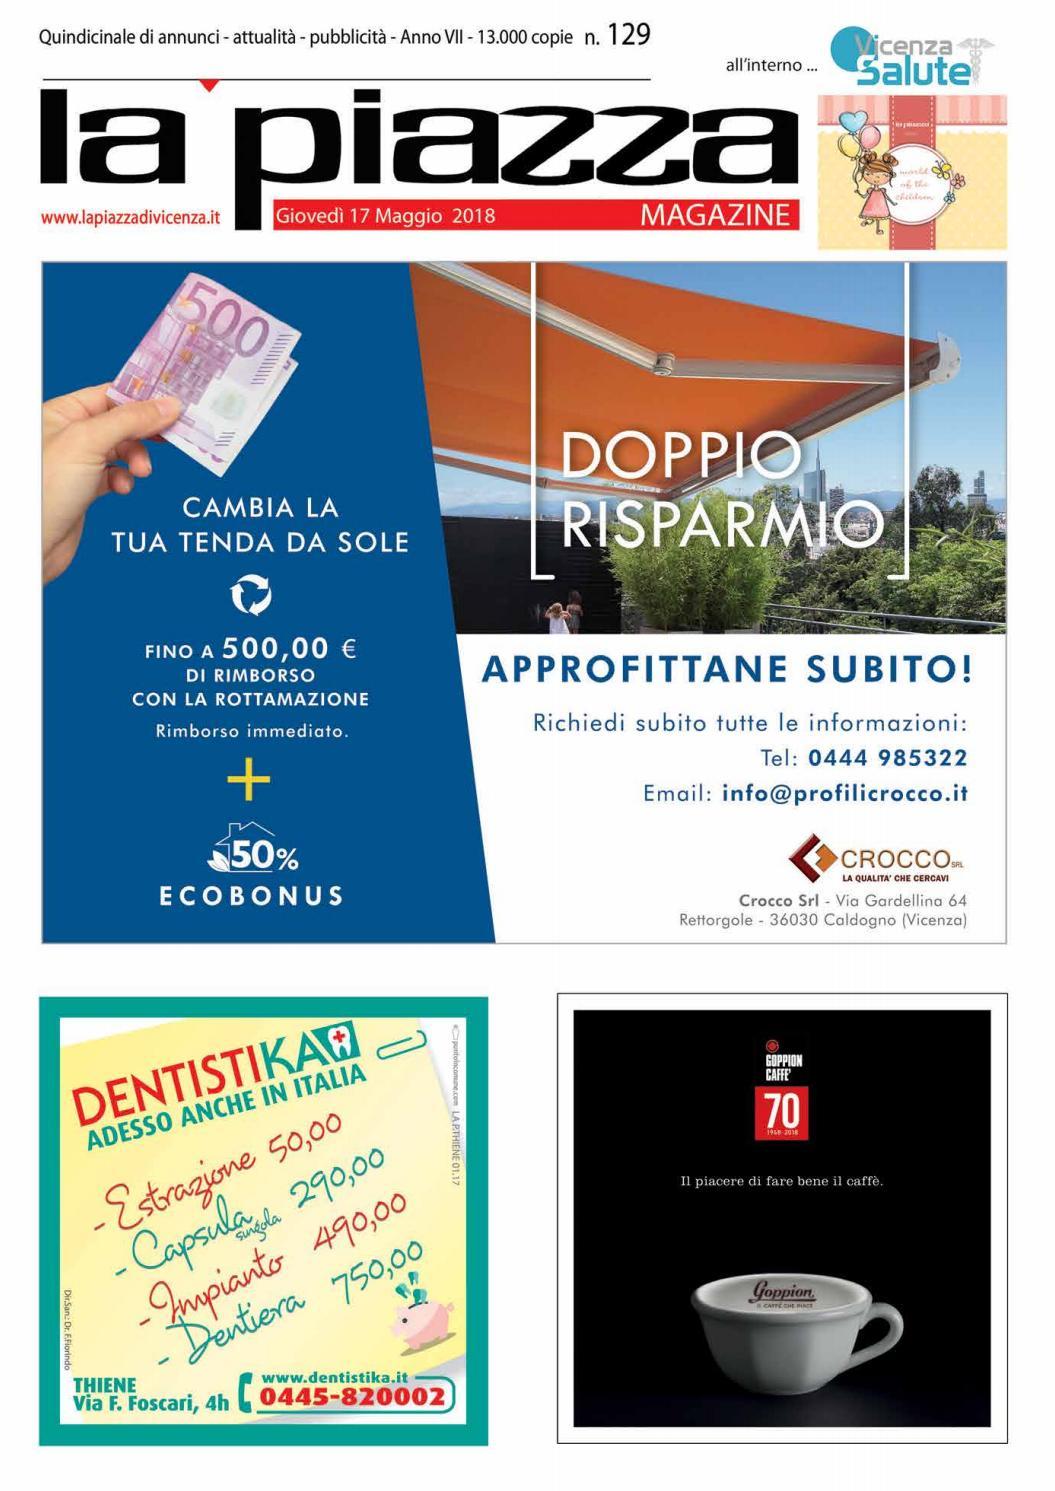 Pubblistudio La Di Vicenza By Srl Issuu Piazza Pubblicità N 129 xtQChsrd